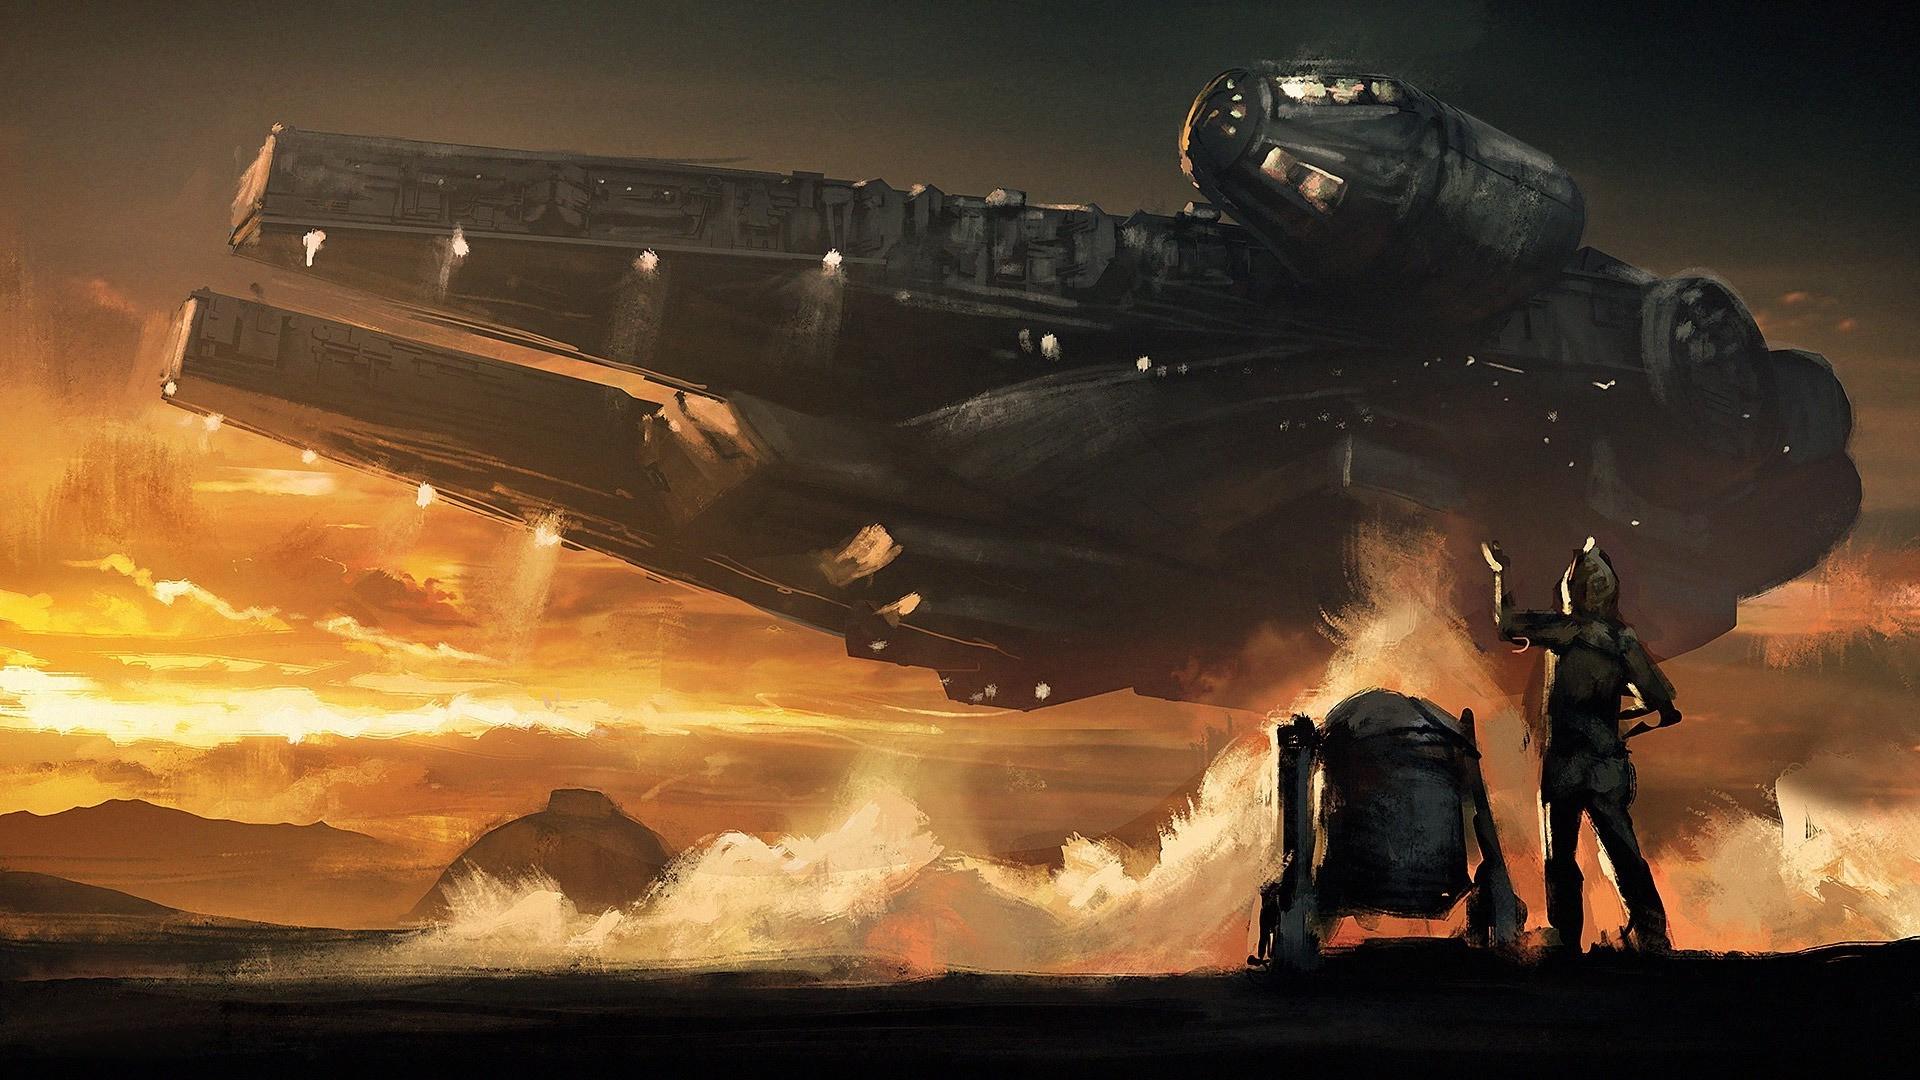 146 Star Wars Art